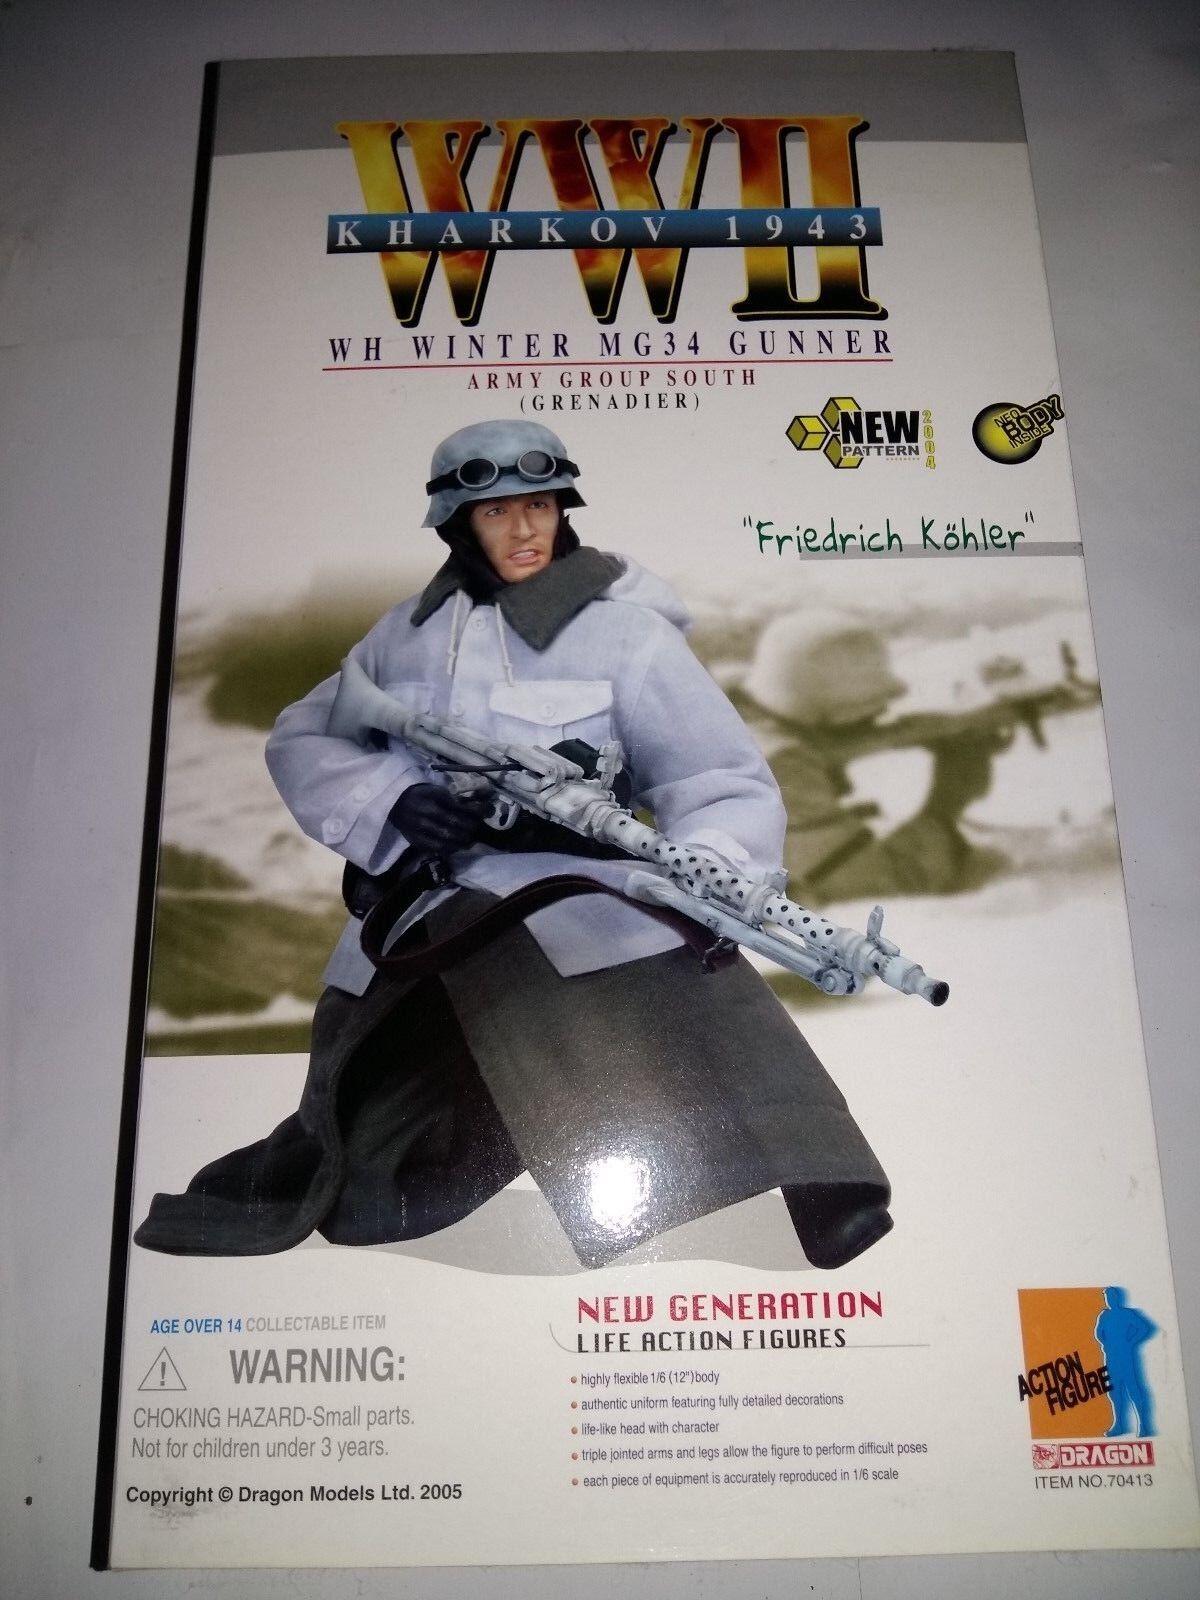 DRAGON. WH Winter MG 40 Gunner. Army group south.Grenadier  Friedrich Kohl . 1 6